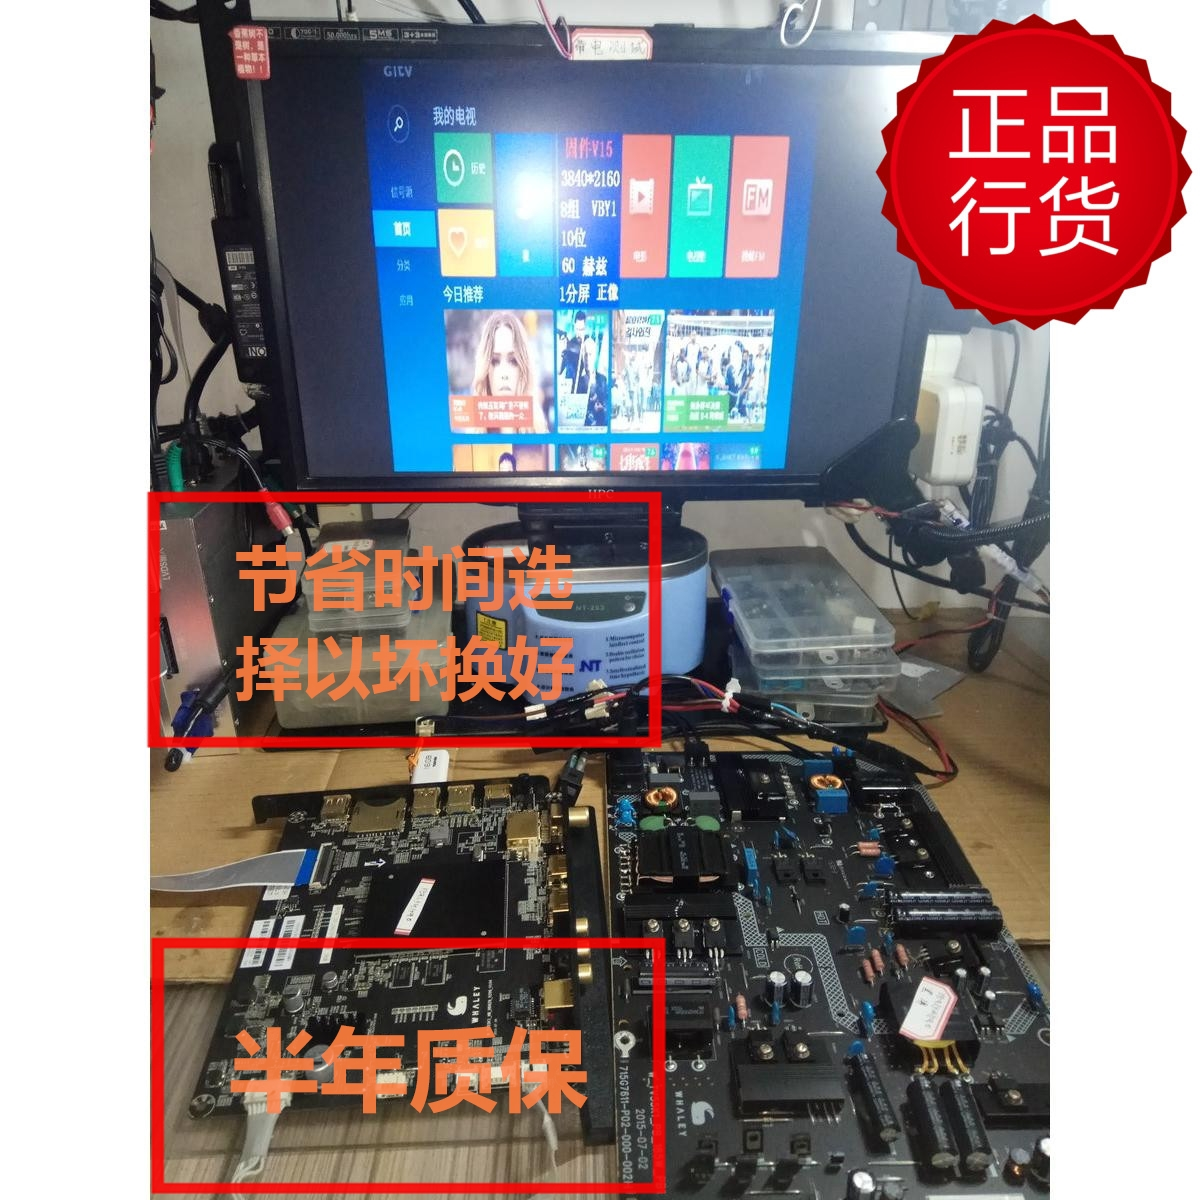 wtv43k1液晶电视主板wtv55k1_mb_mo828_0208  配件 出售 原装